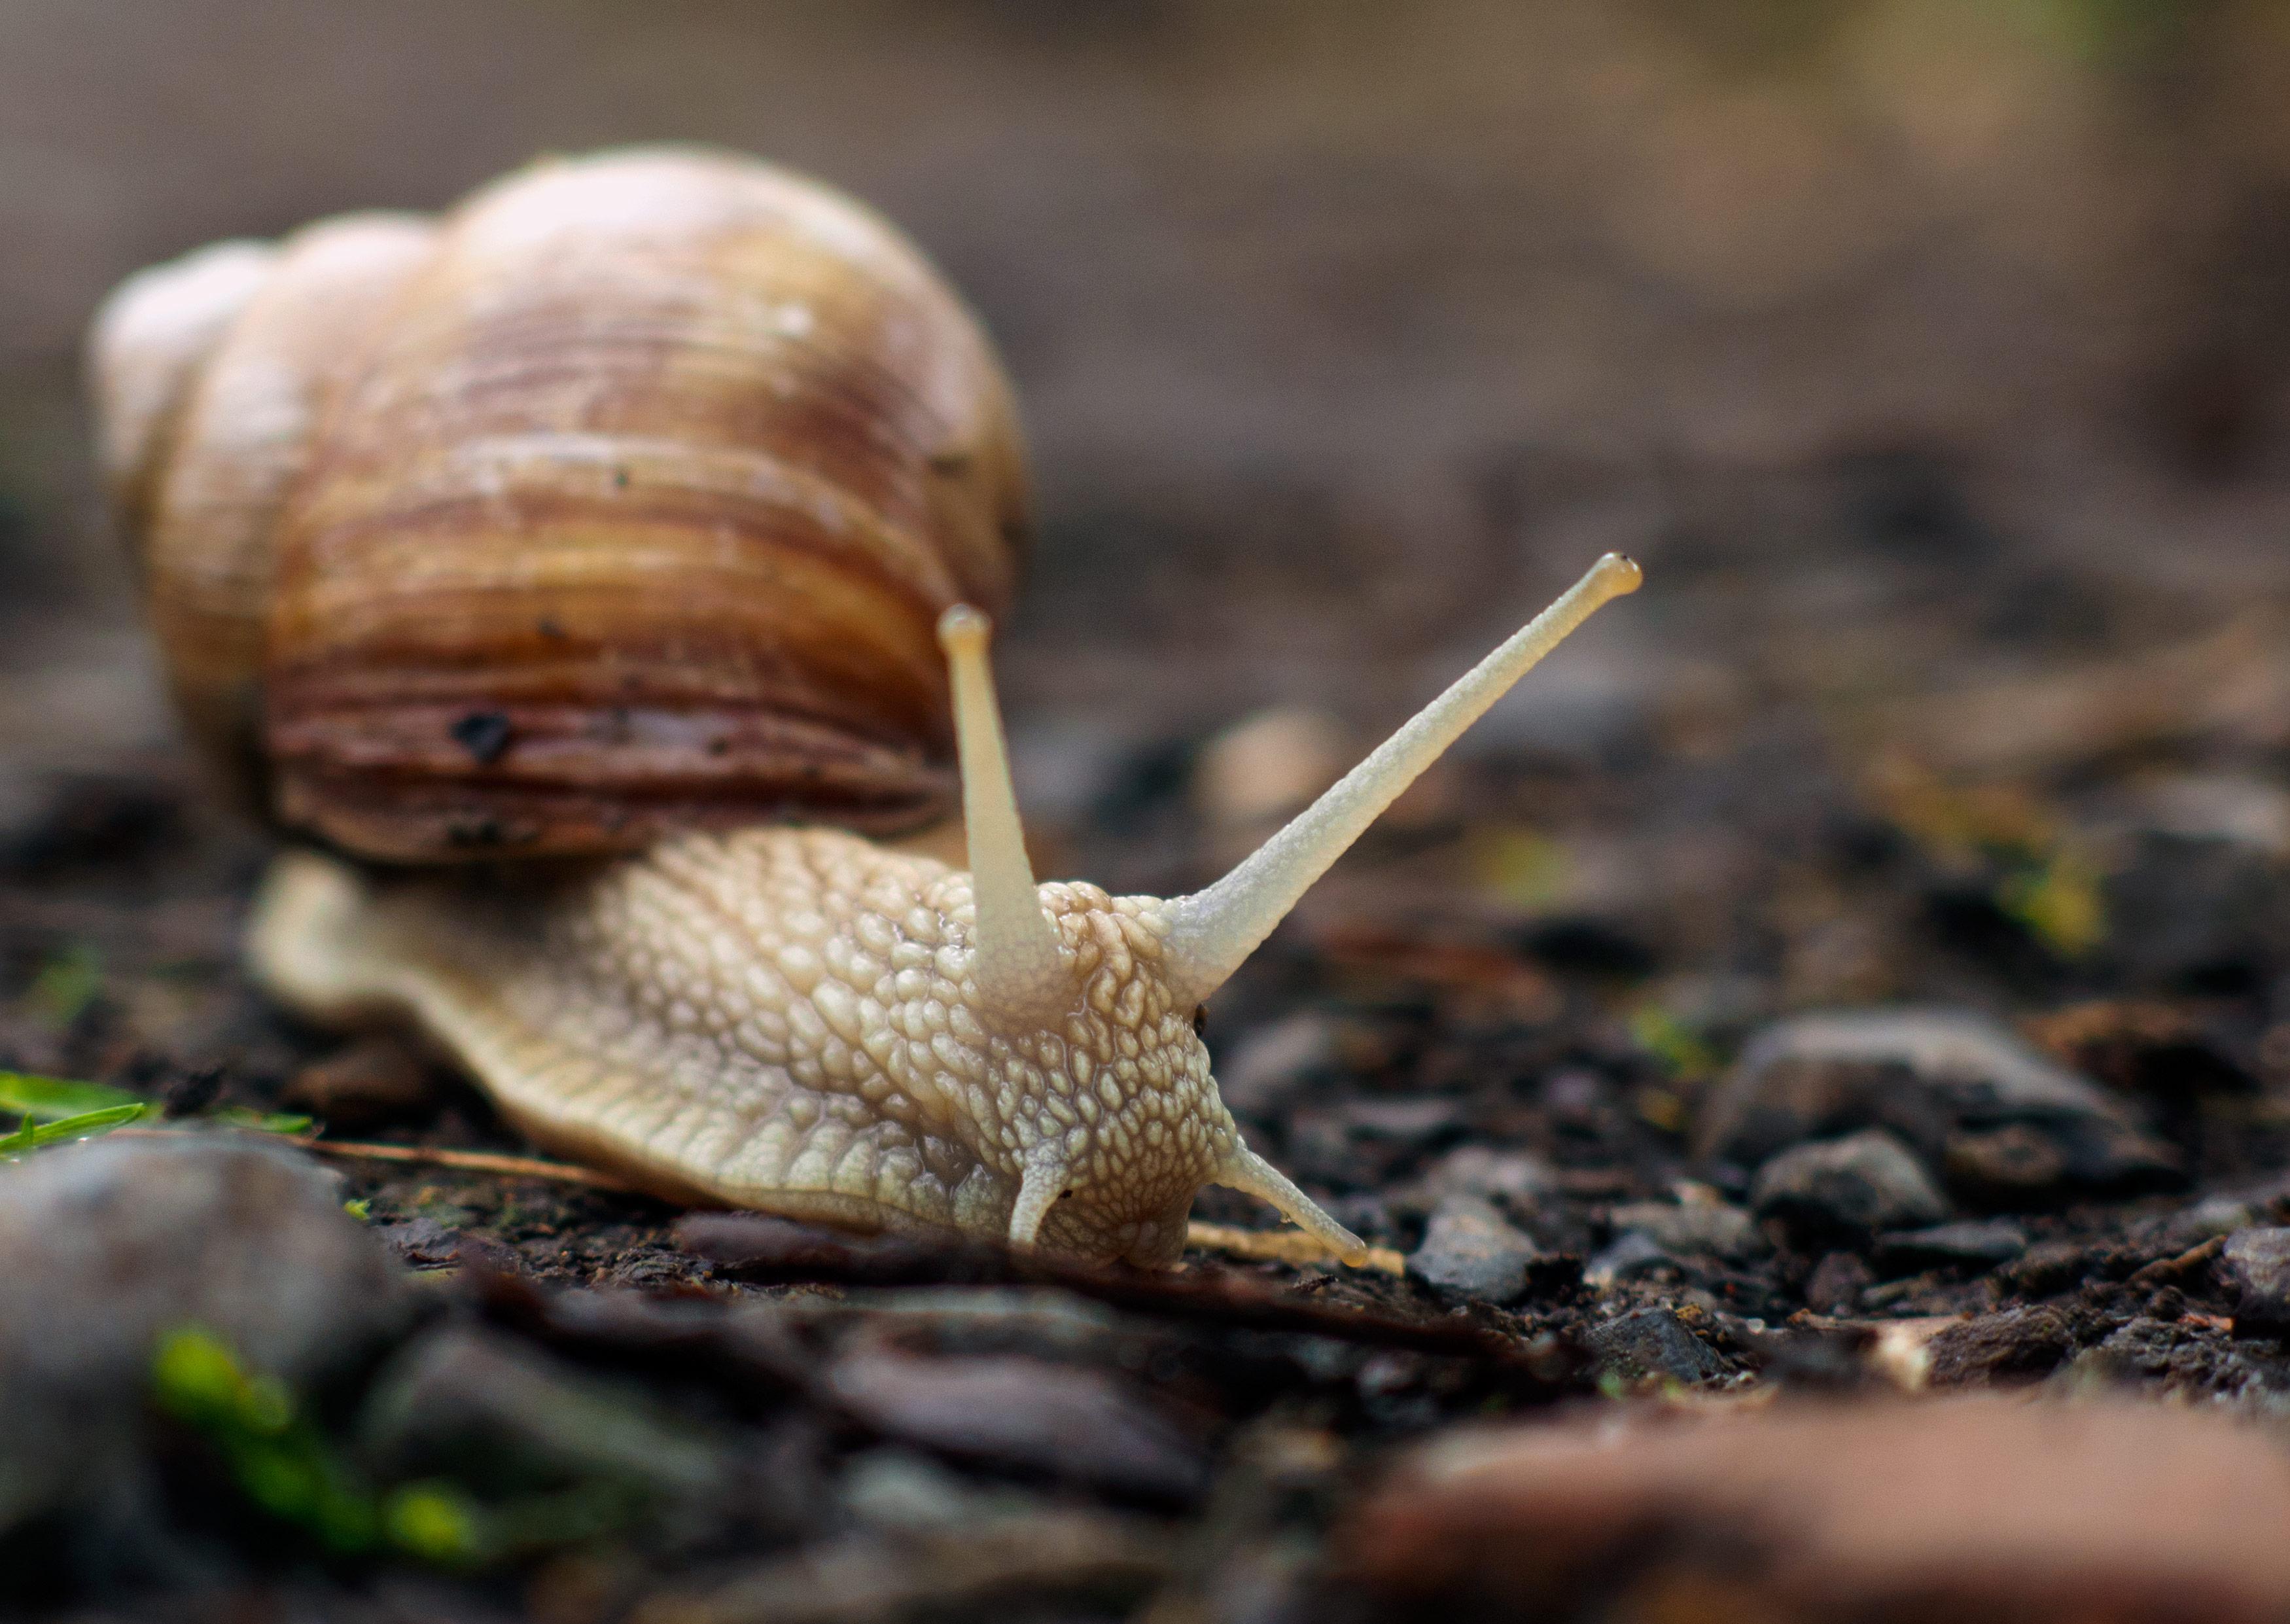 Snail Close Up - FREE image on LibreShot